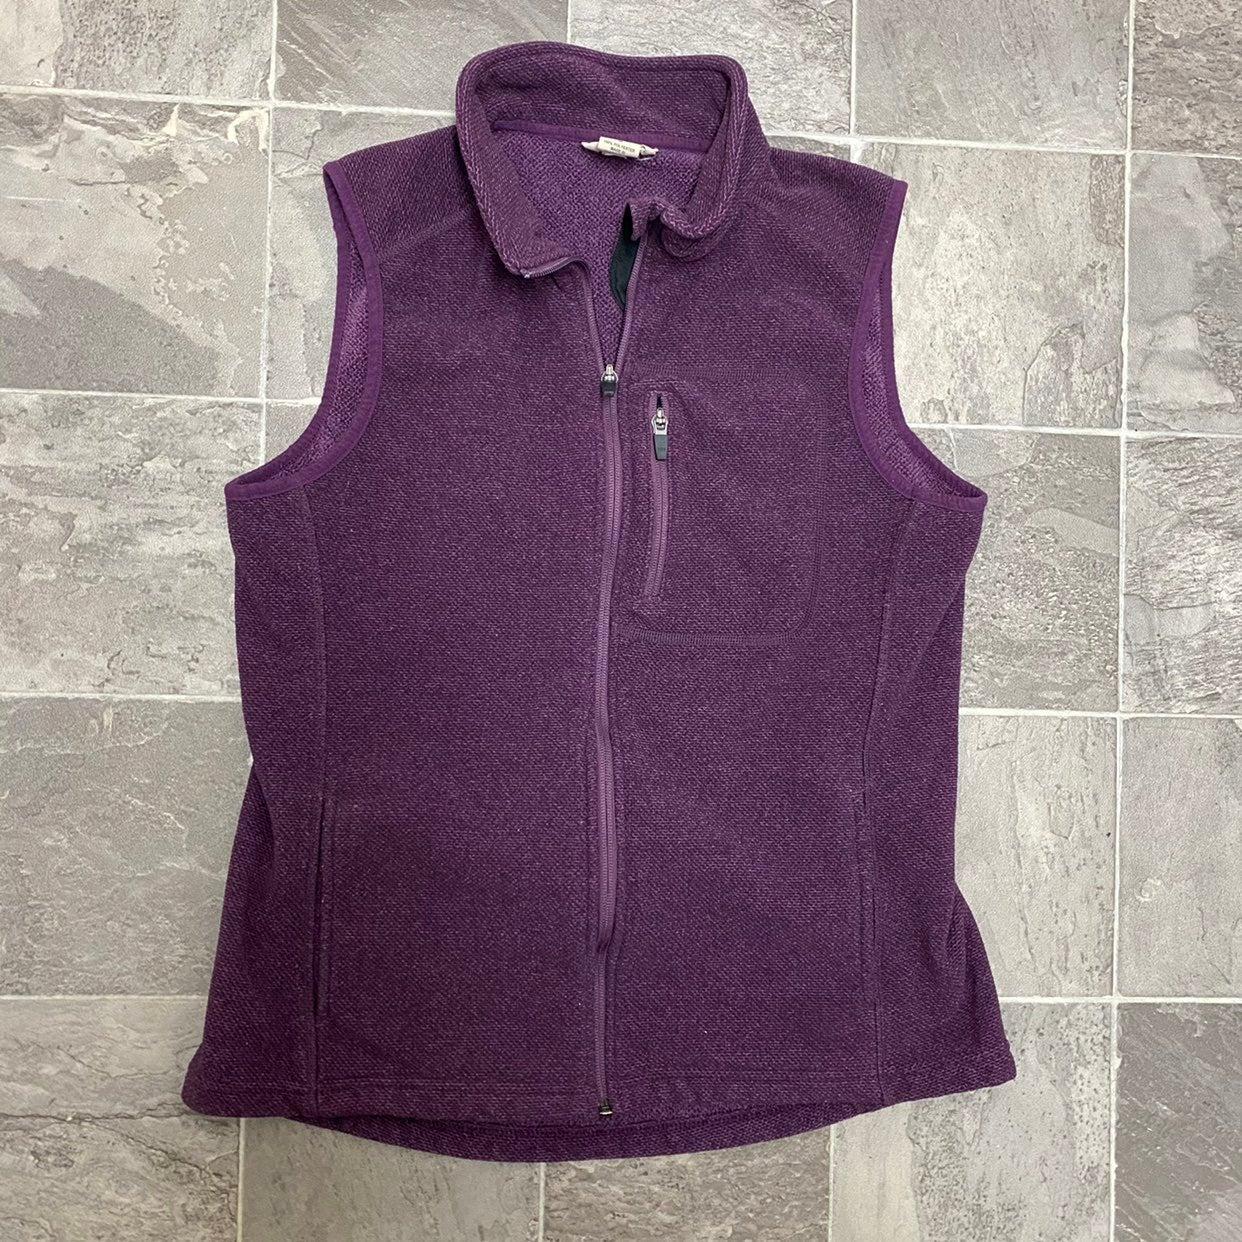 Womens Duluth Trading Co Fleece Vest